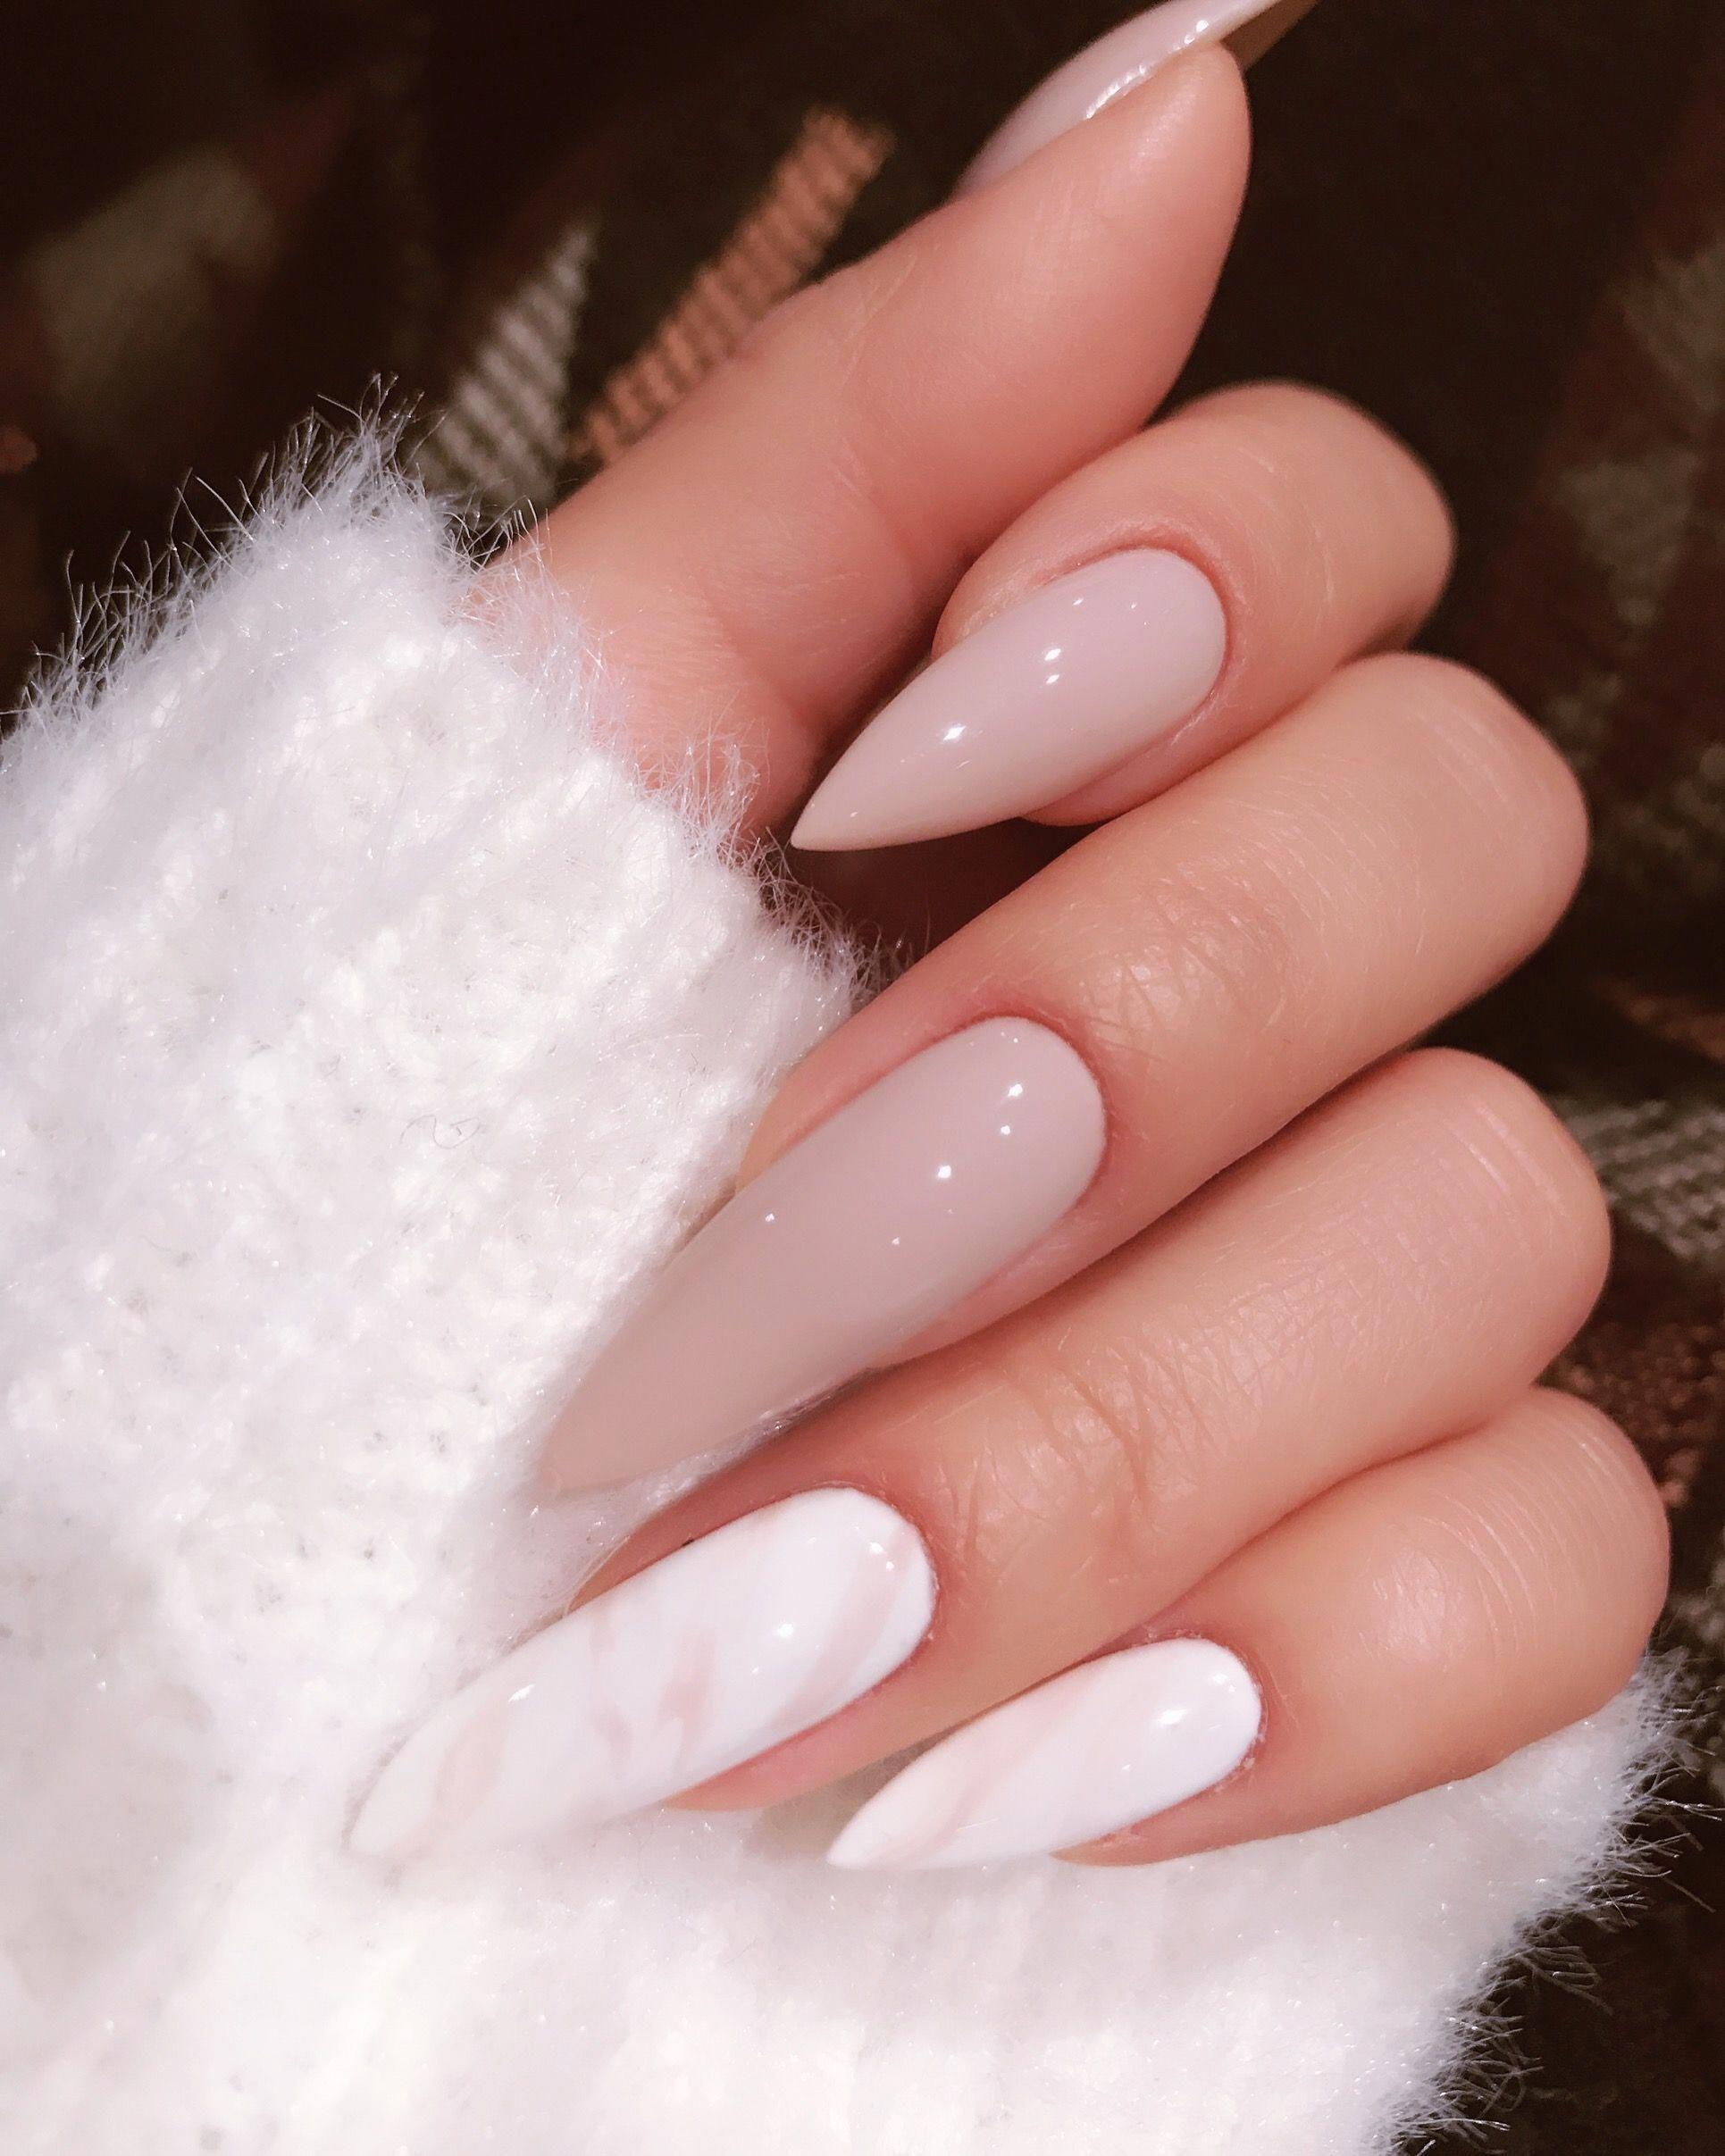 Pin By Weronika Fornal On Nails Dlugie Paznokcie Ladne